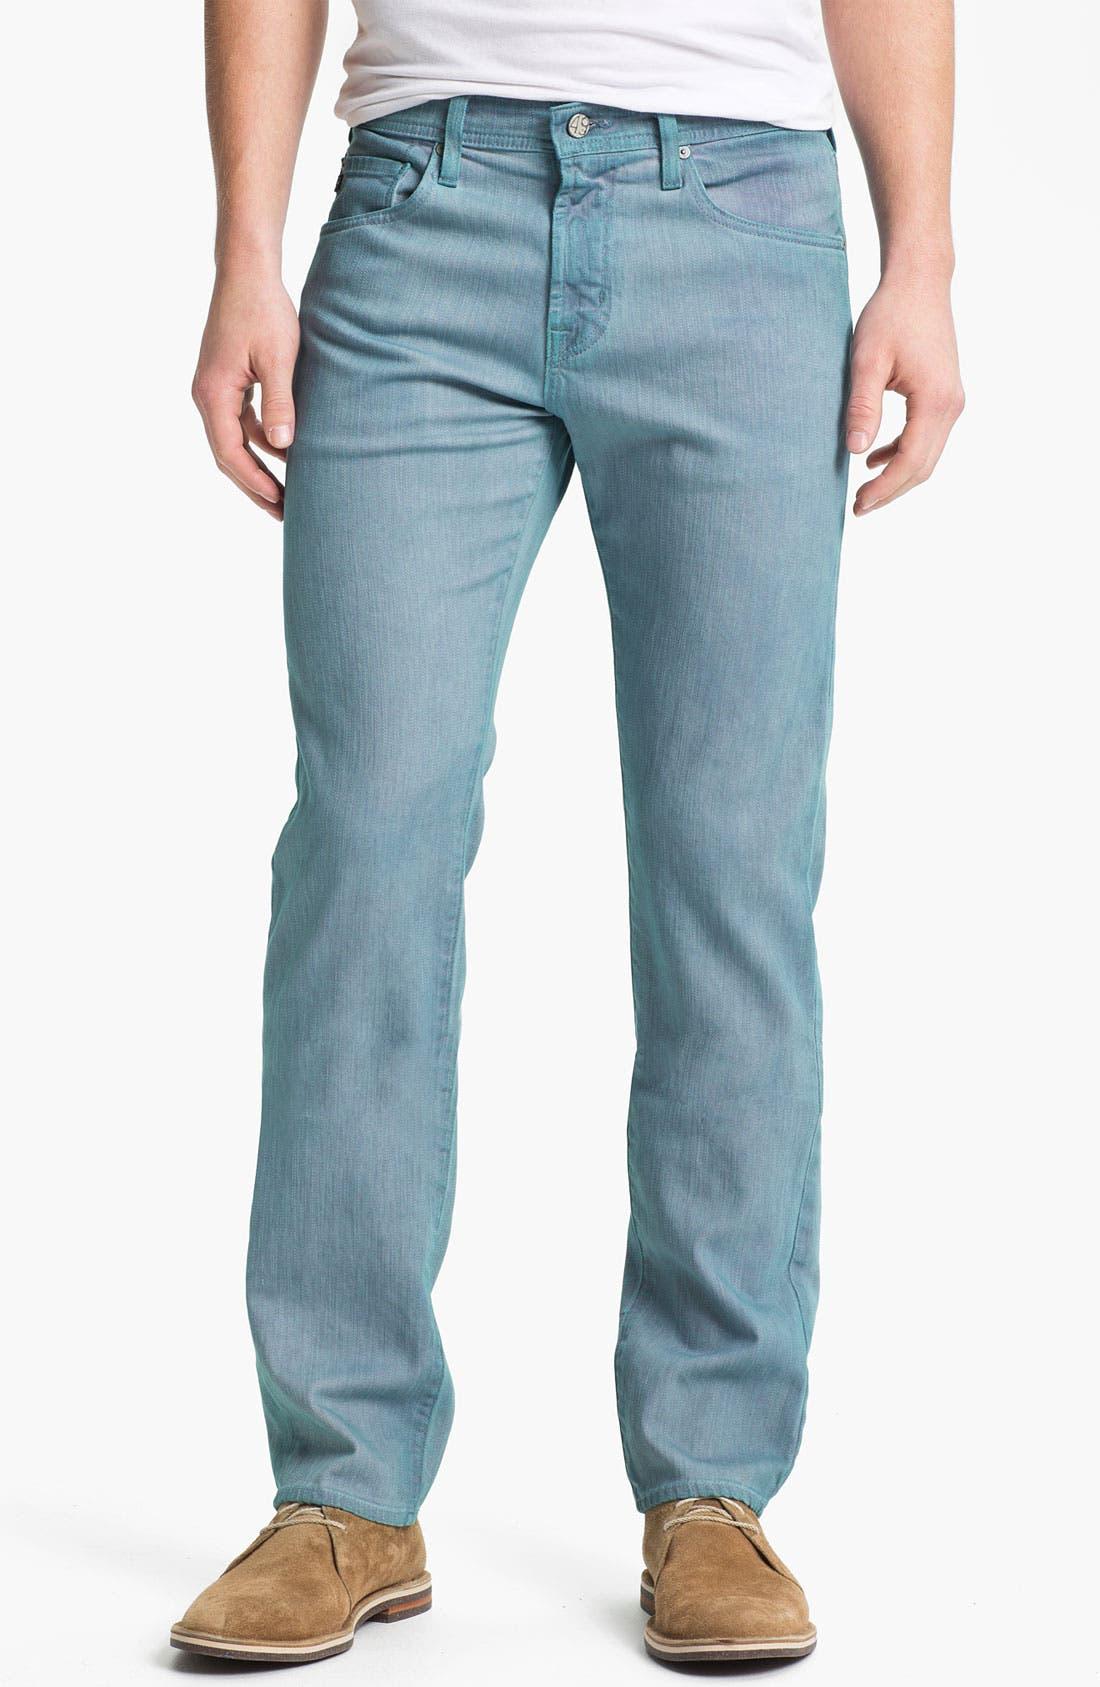 Alternate Image 1 Selected - AG Jeans 'Matchbox' Slim Fit Jeans